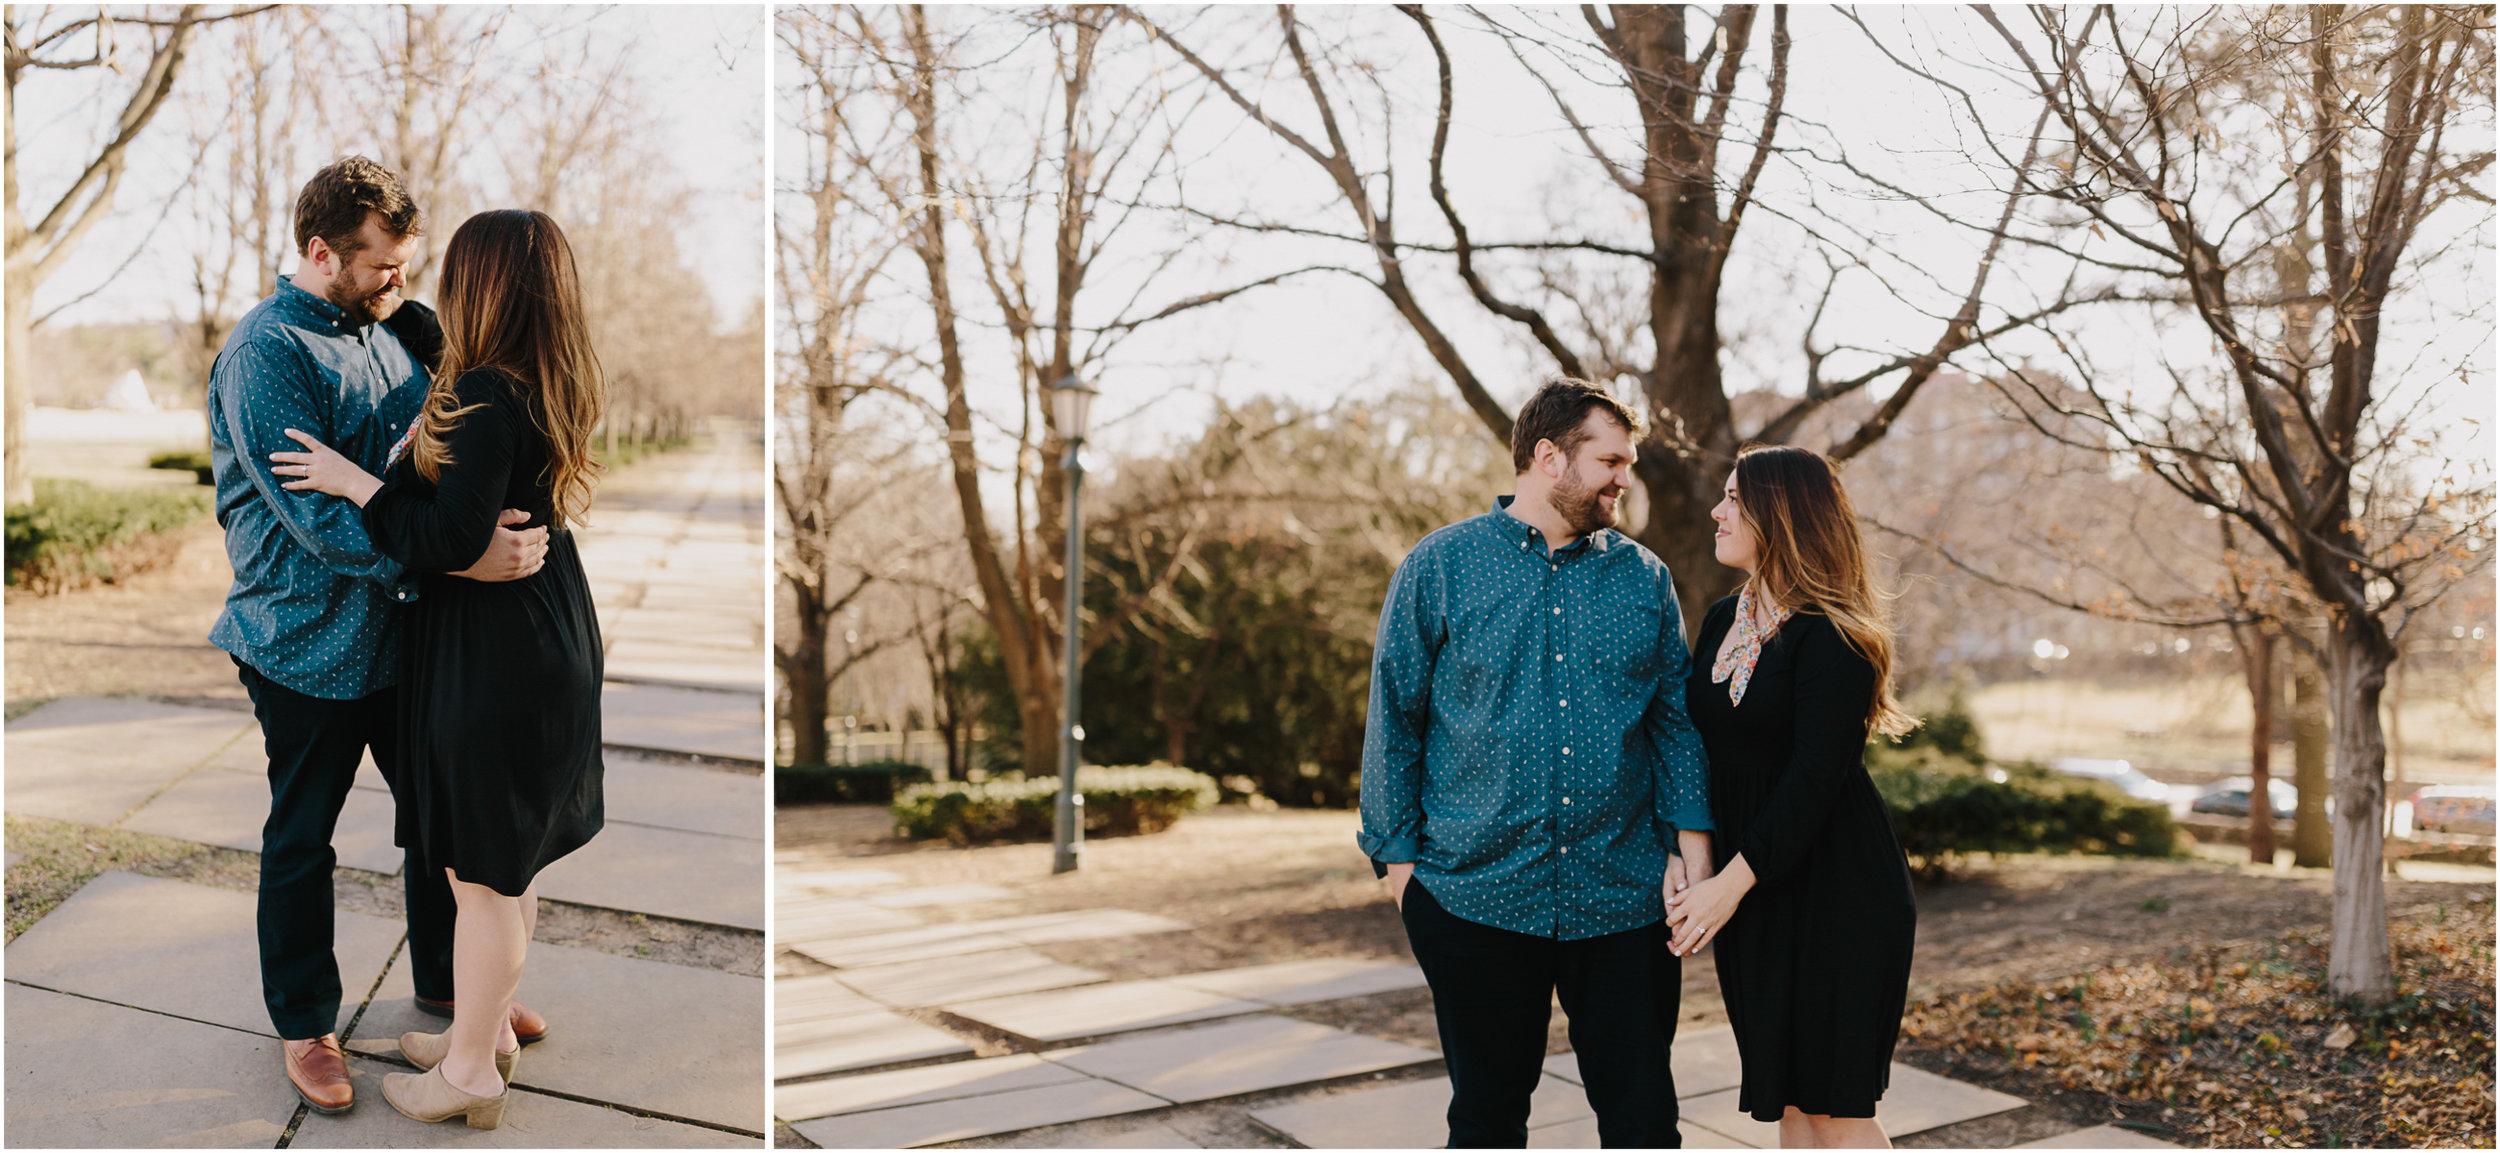 alyssa barletter photography surprise proposal nelson atkins museum kansas city photographer-10.jpg